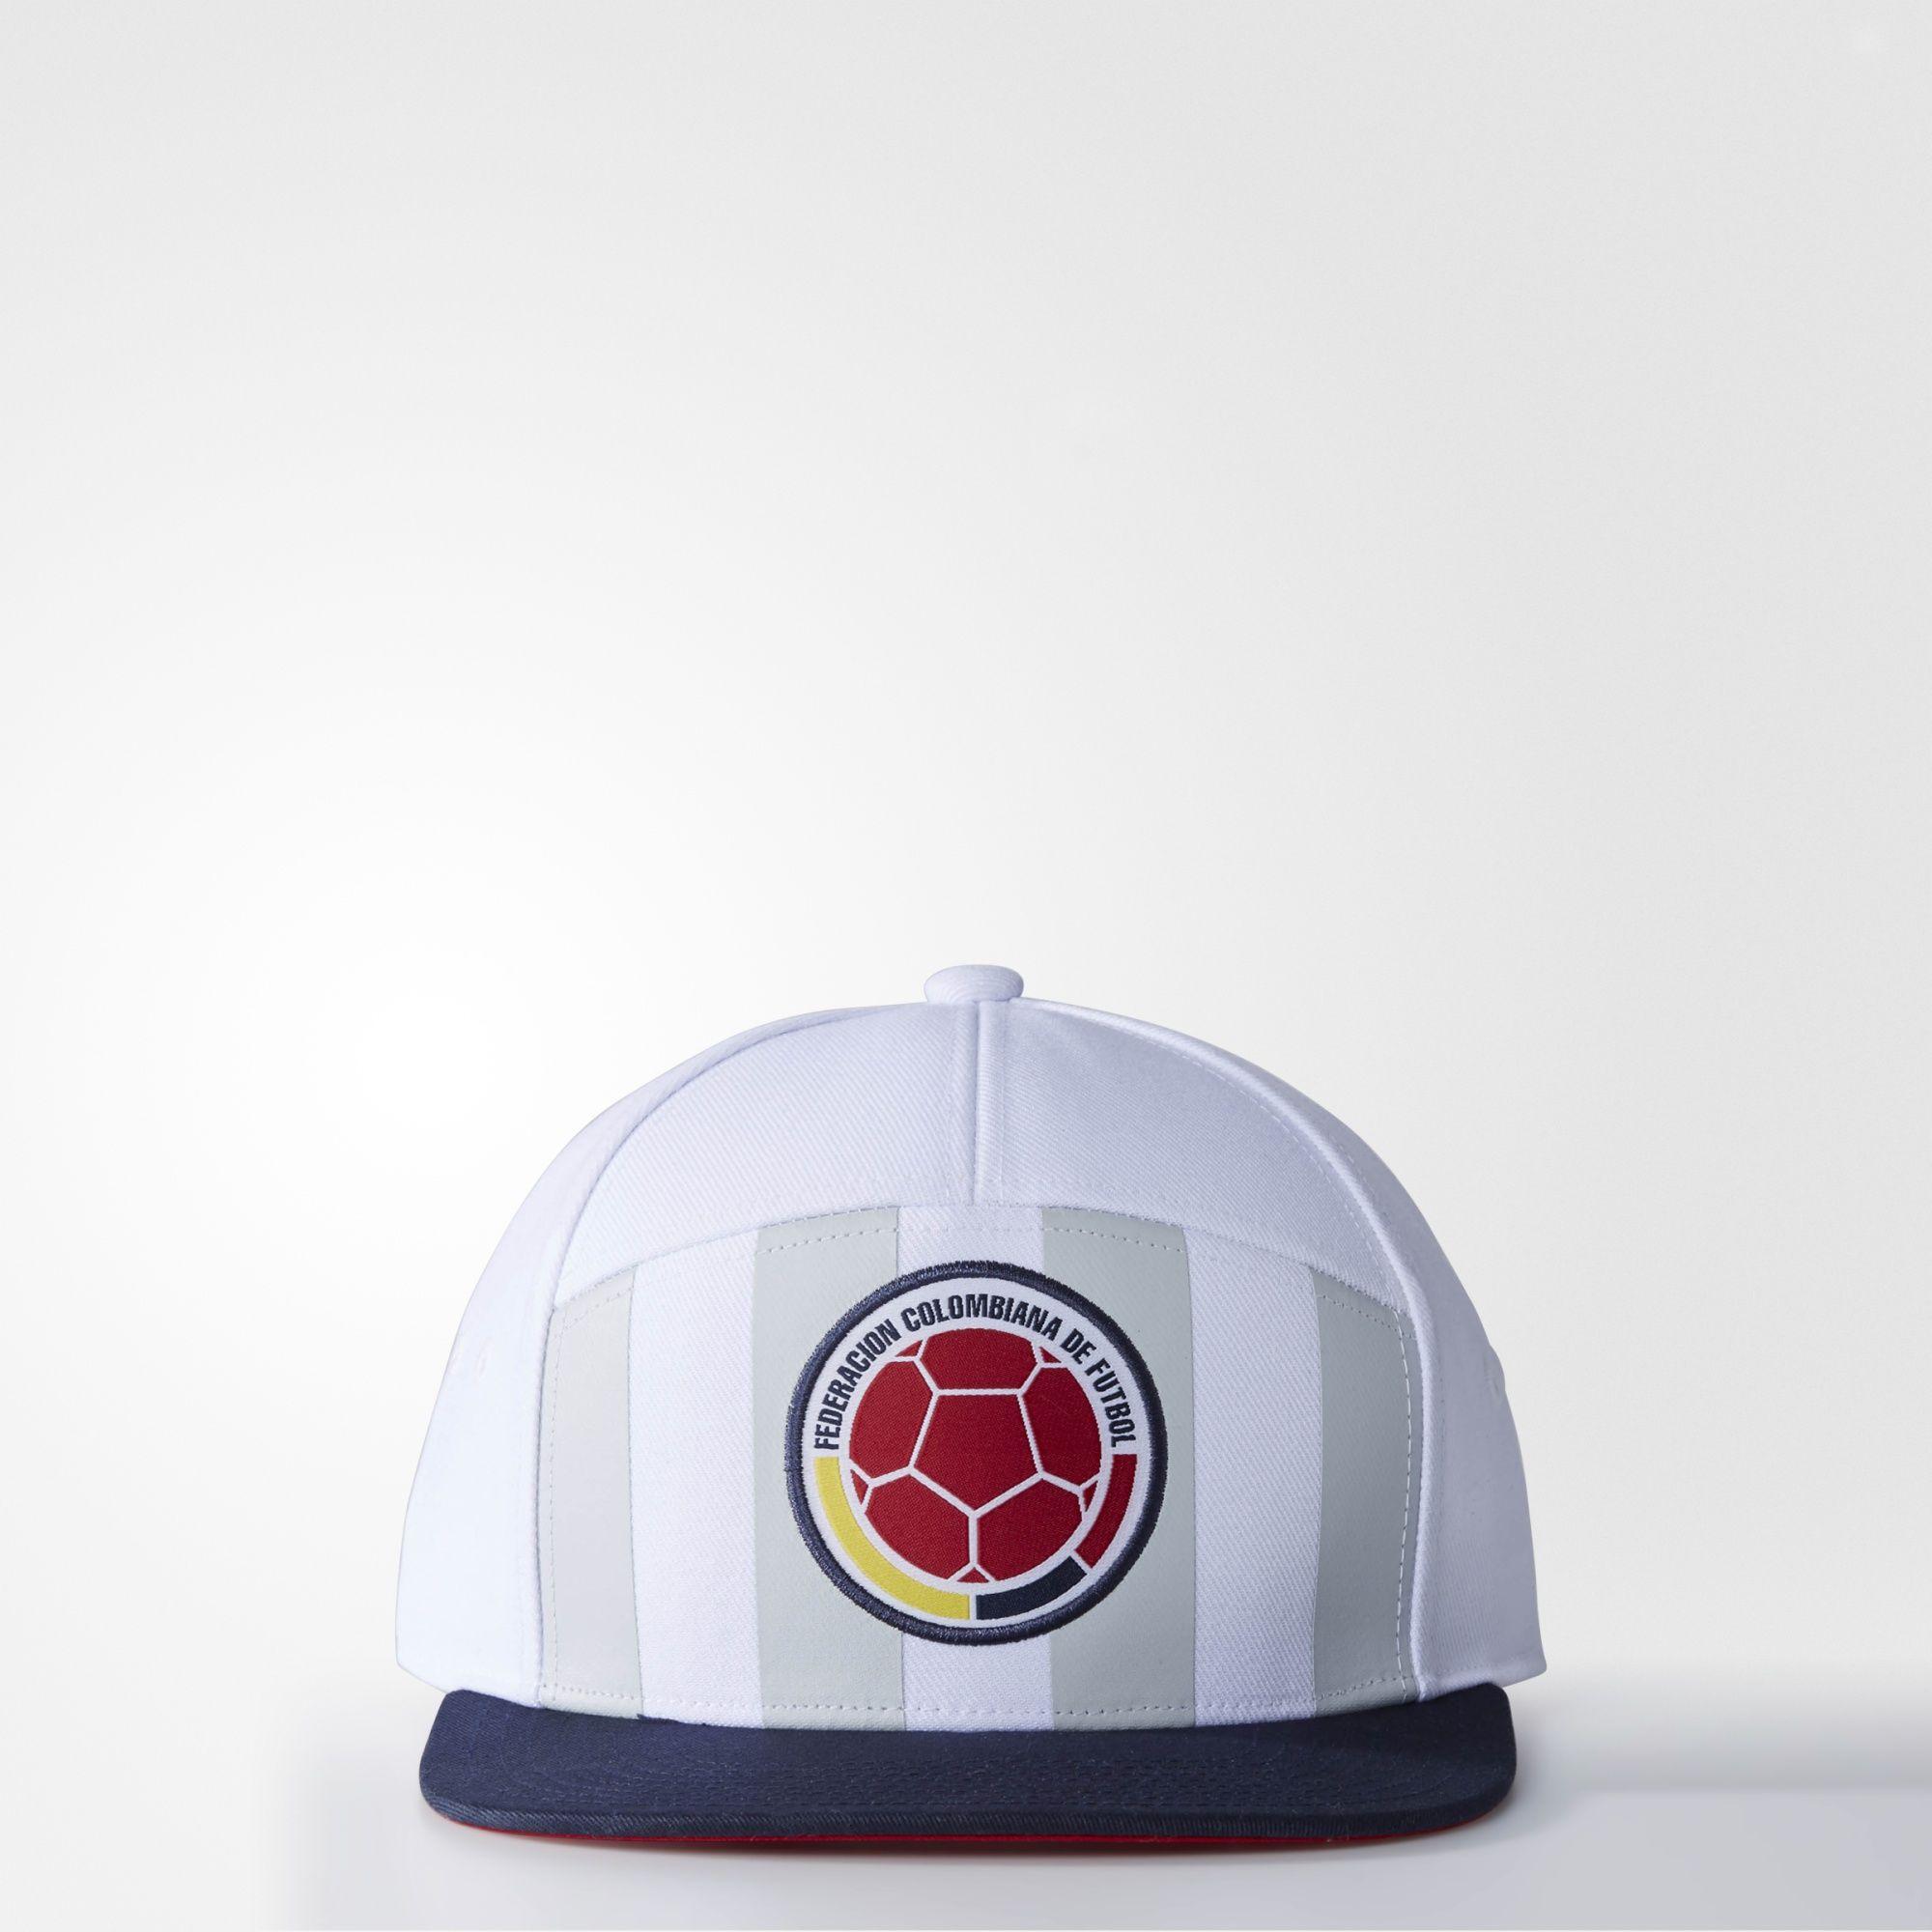 Gorra adidas Colombia Colombia Gorra CF FCF adidas Blanco 4289aff - burpimmunitet.website